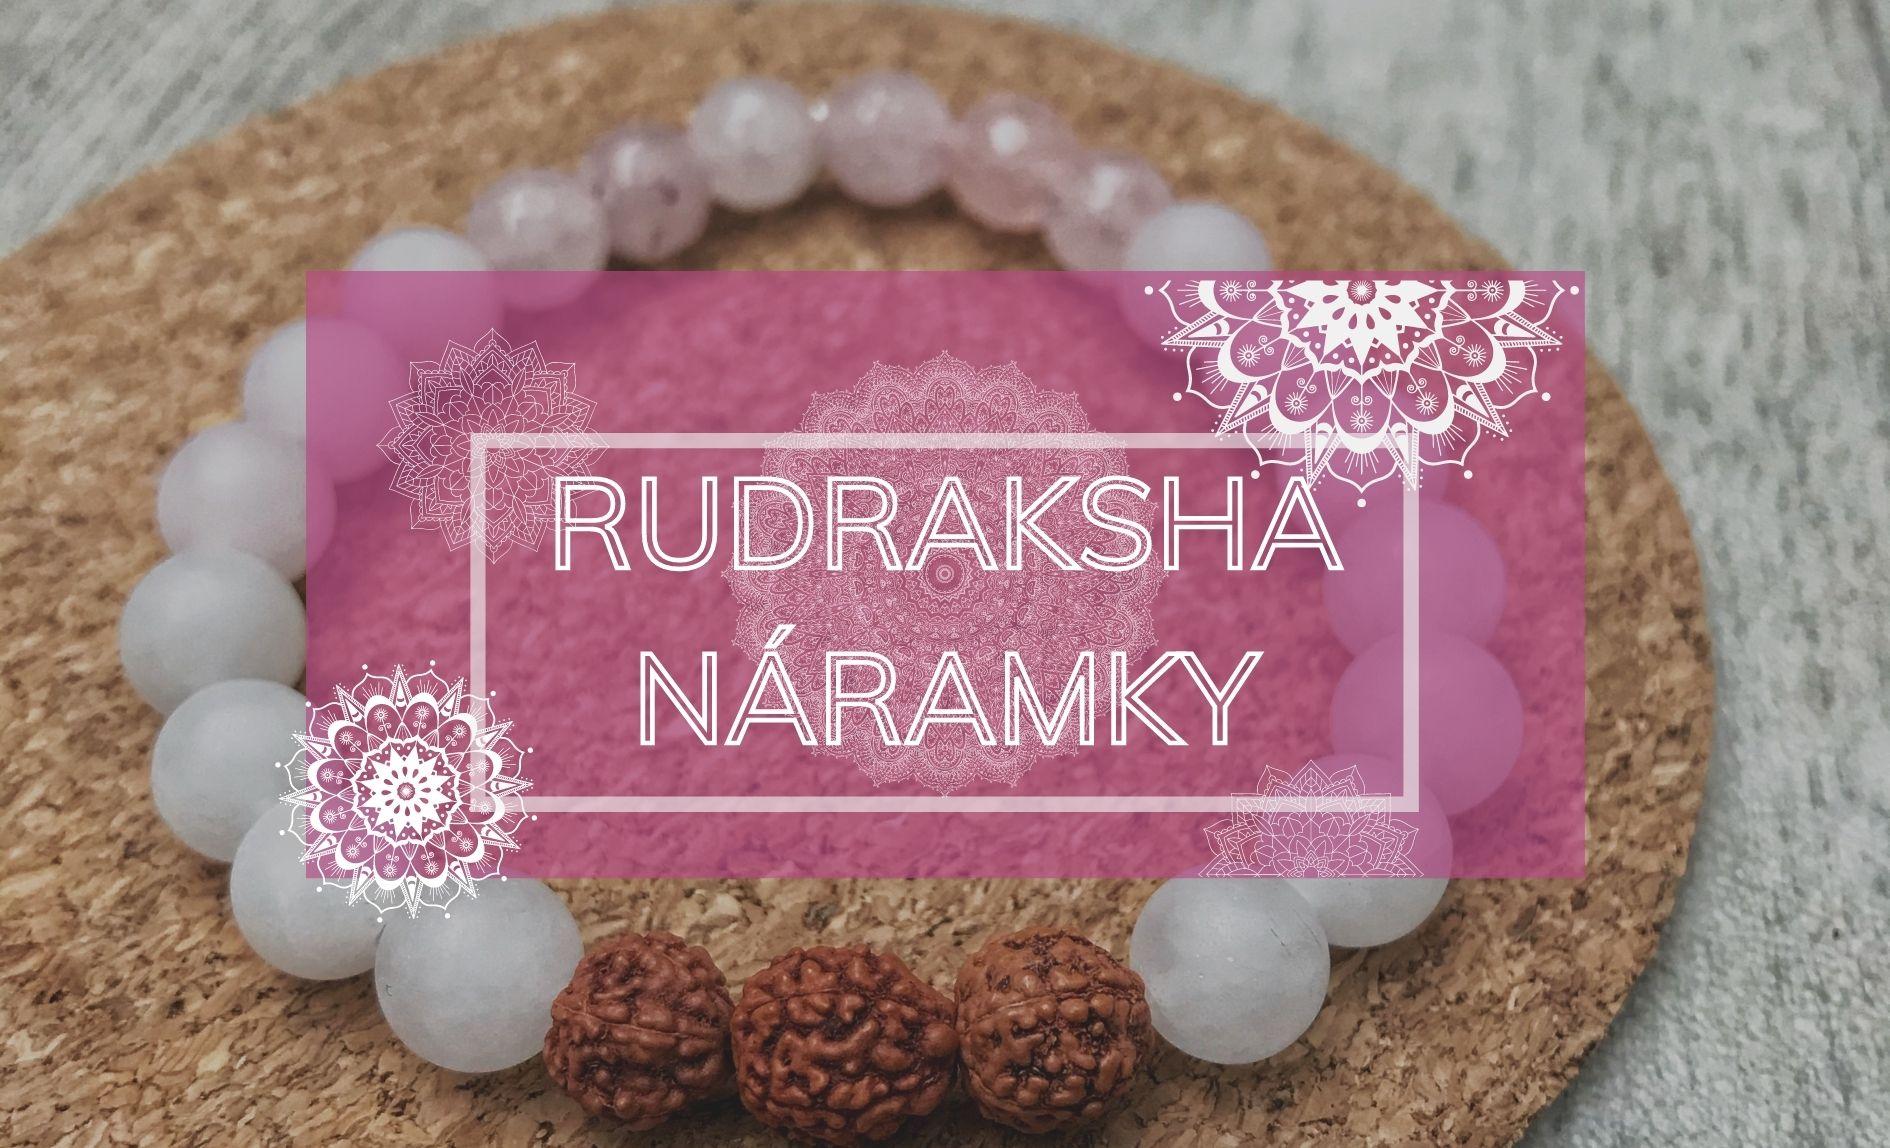 Rudraksha náramky